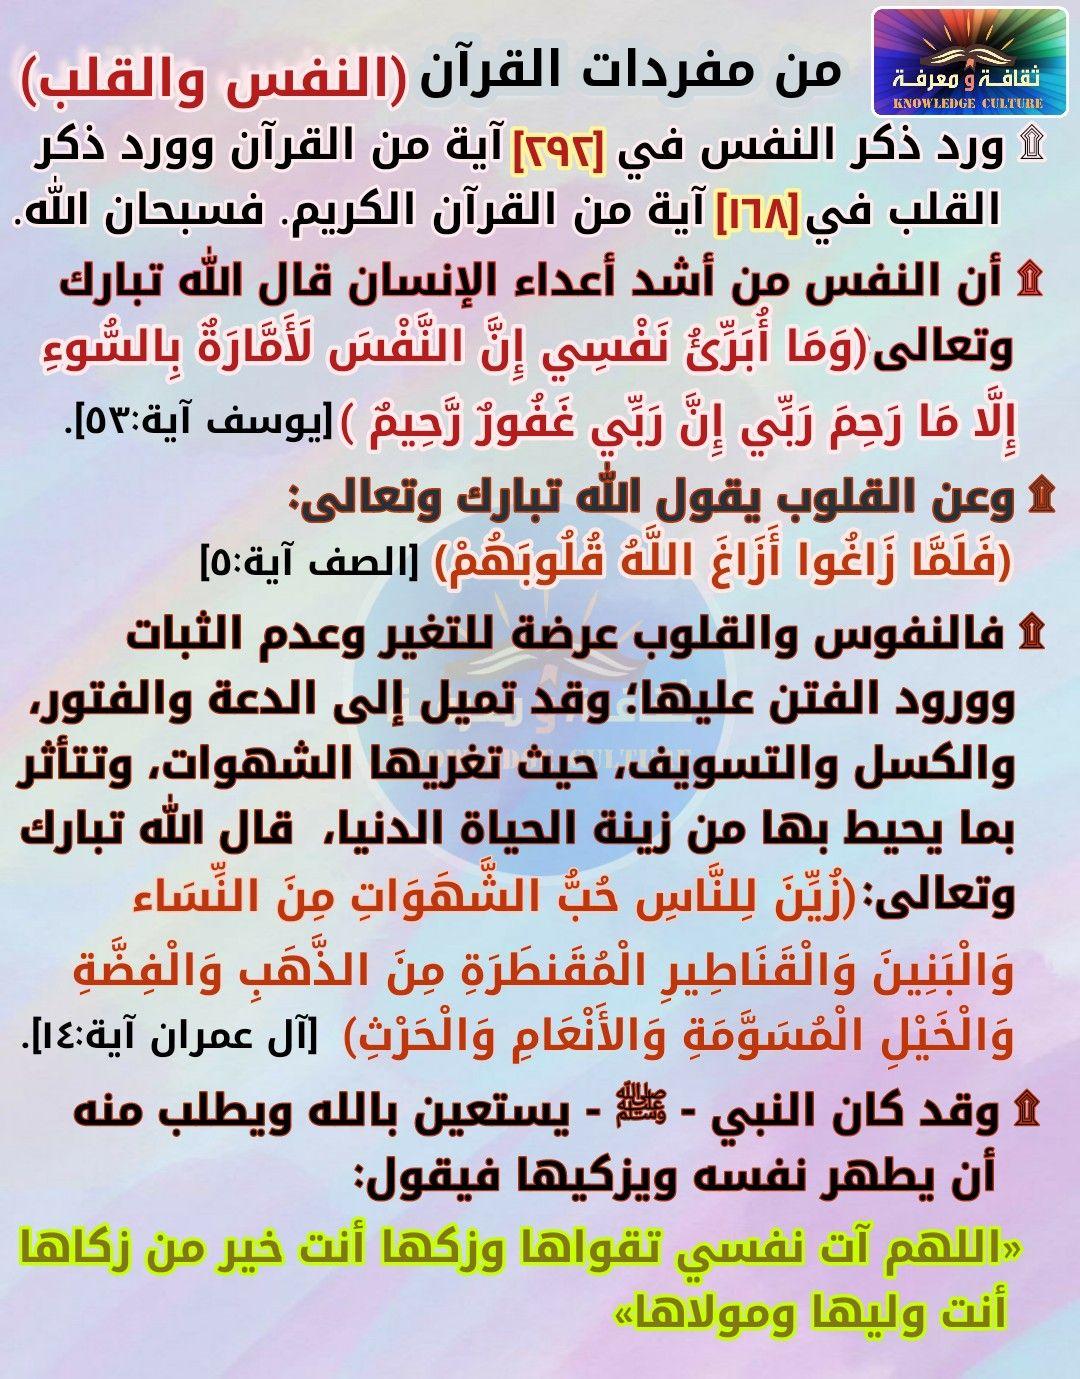 Pin By ثقافة و معرفة On تأملات قرآنية Periodic Table Event Ticket